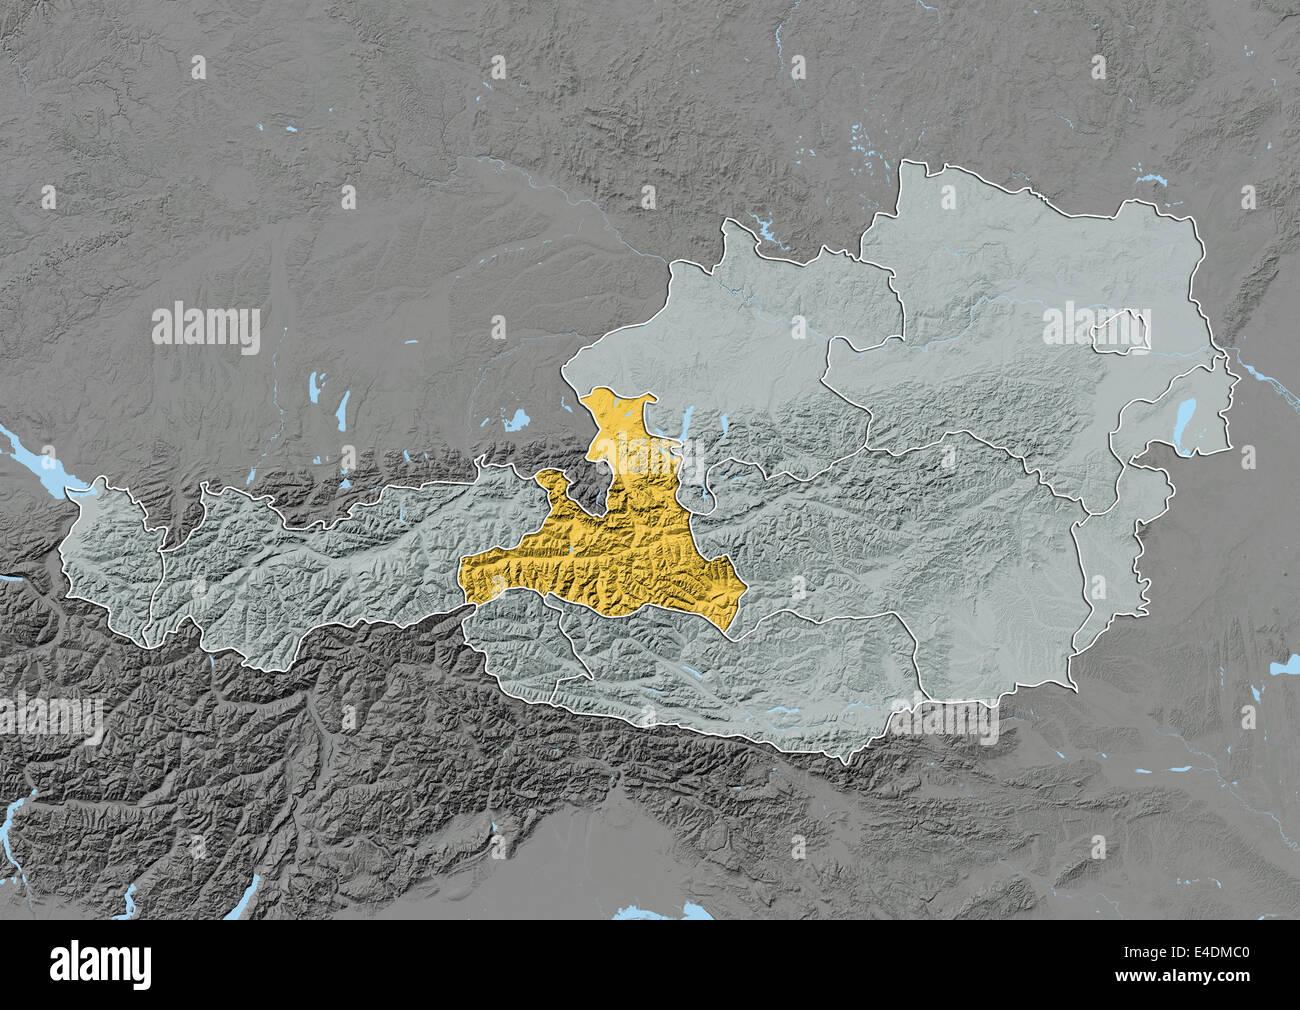 Salzburg state map stock photos salzburg state map stock images state of salzburg austria relief map stock image gumiabroncs Gallery